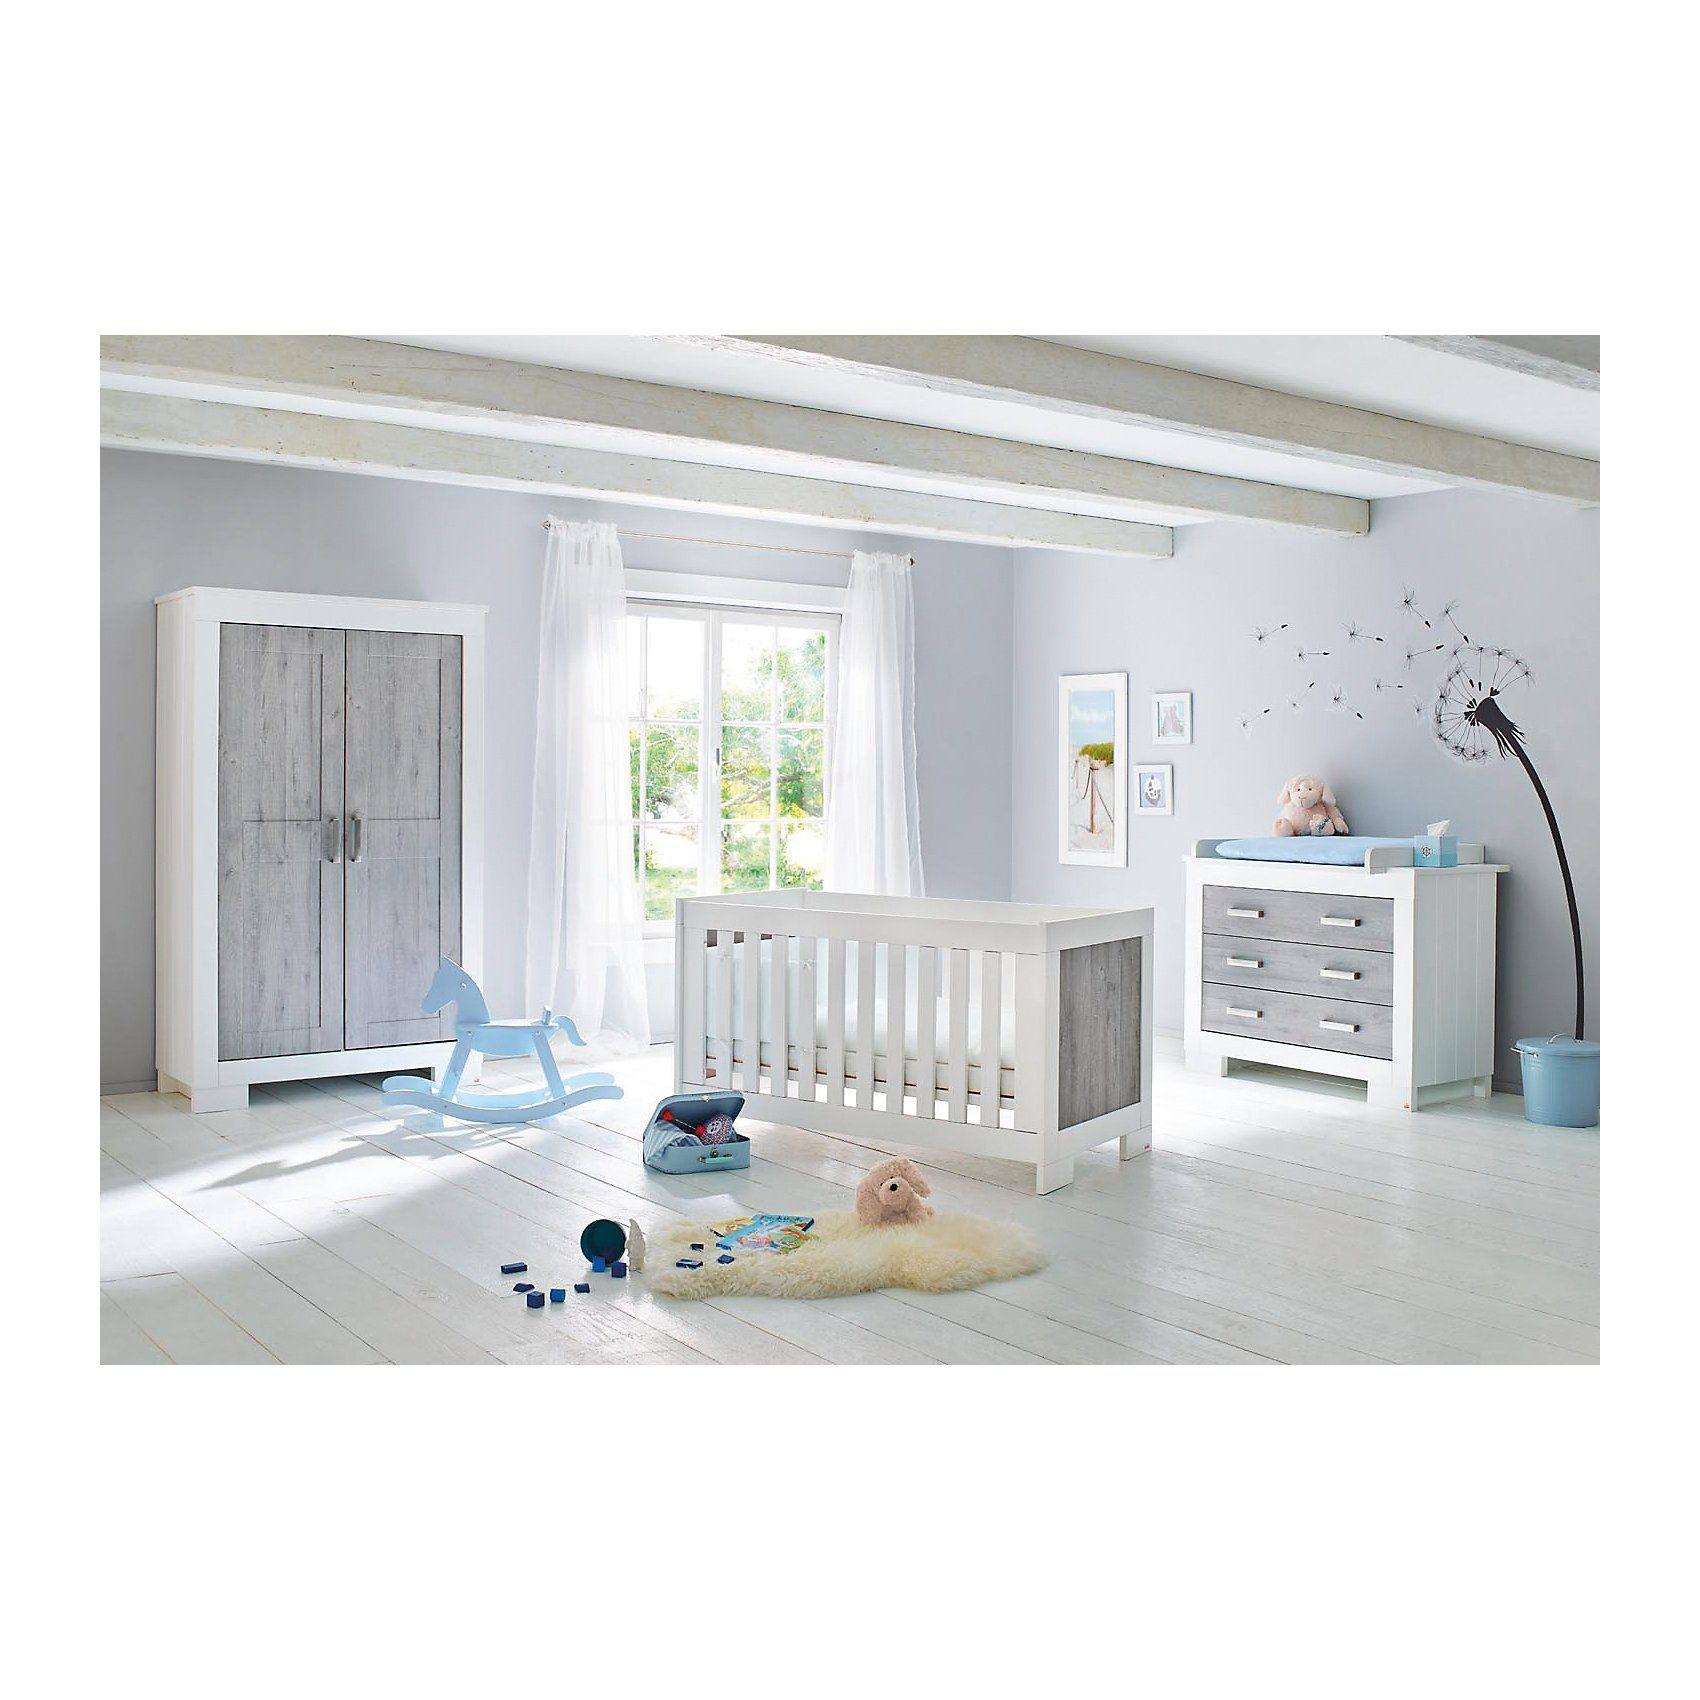 Pinolino Komplett Kinderzimmer LOLLE, (Kinderbett, Wickelkommode und